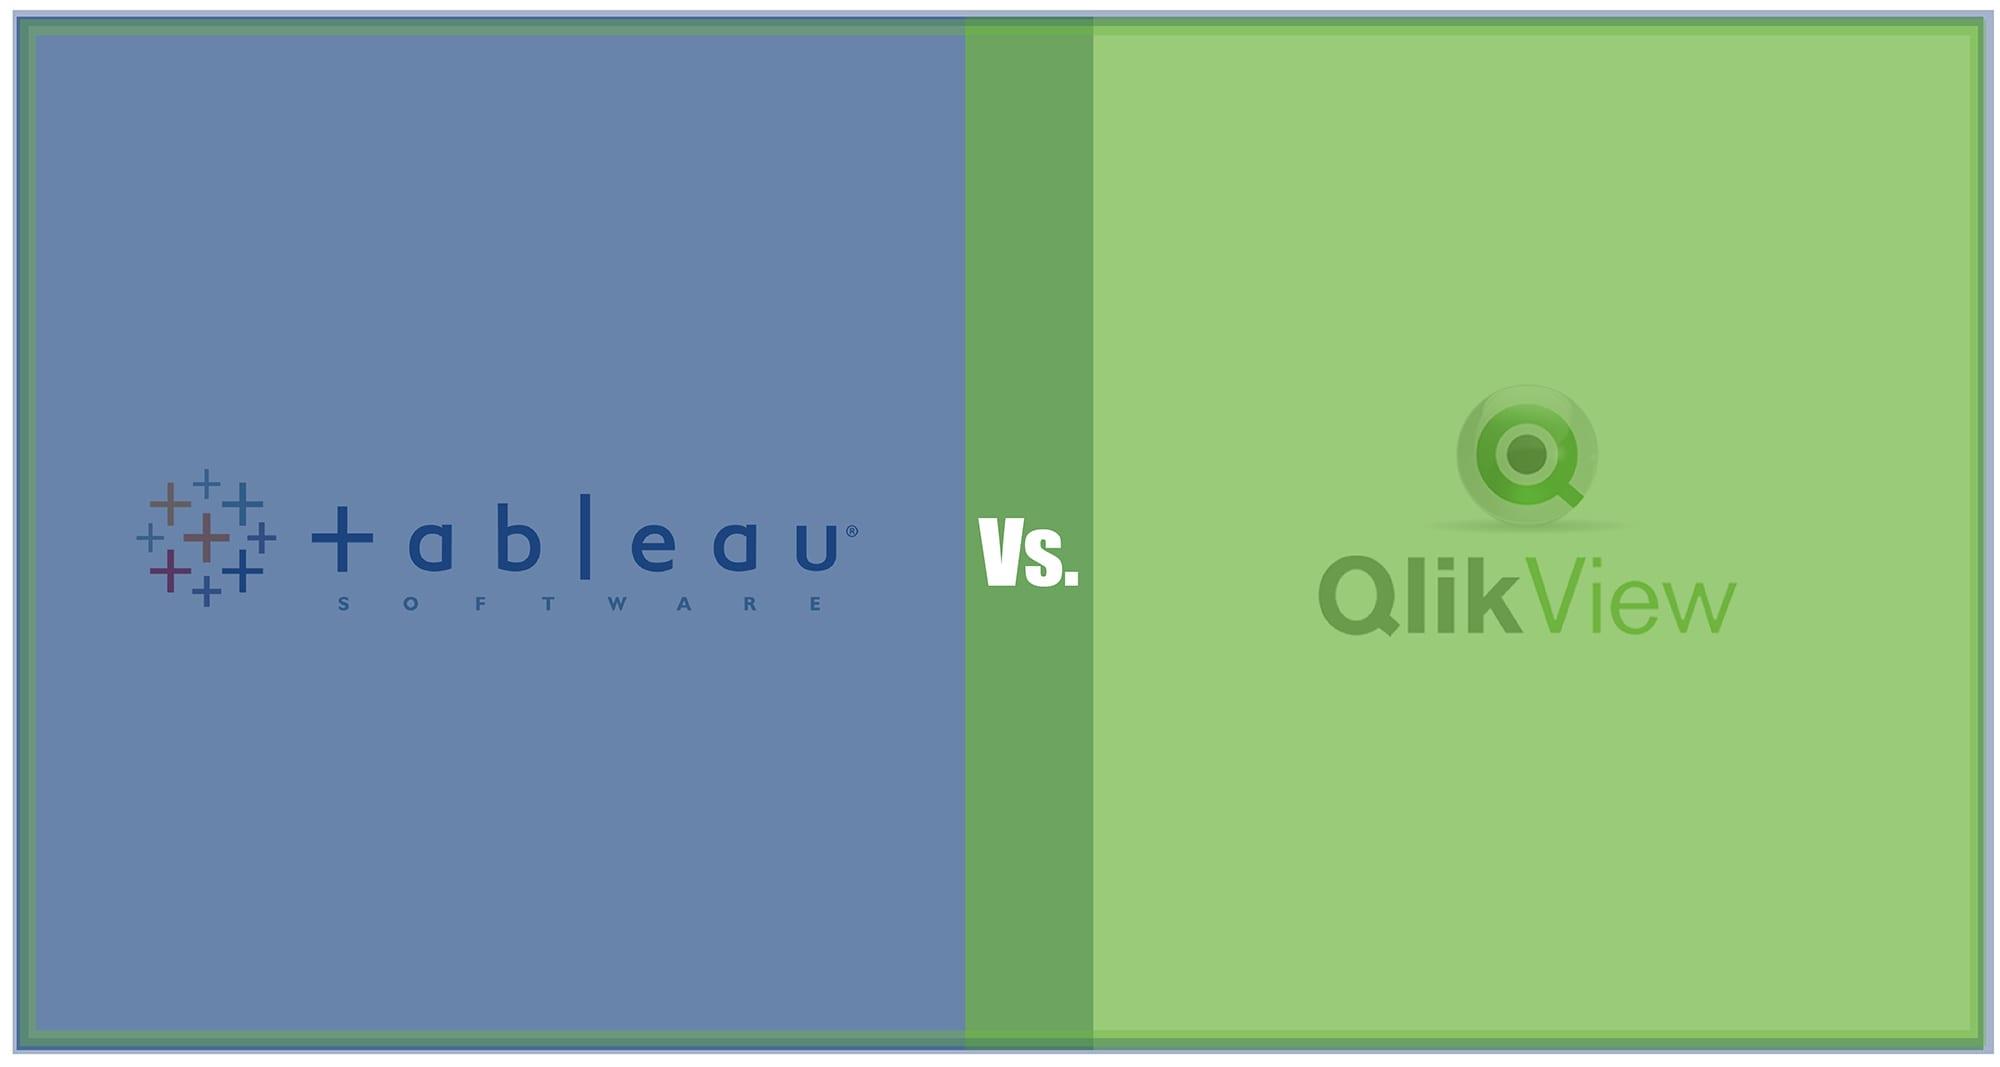 Tableau Vs Qlik Comparing Data Visualization Tools